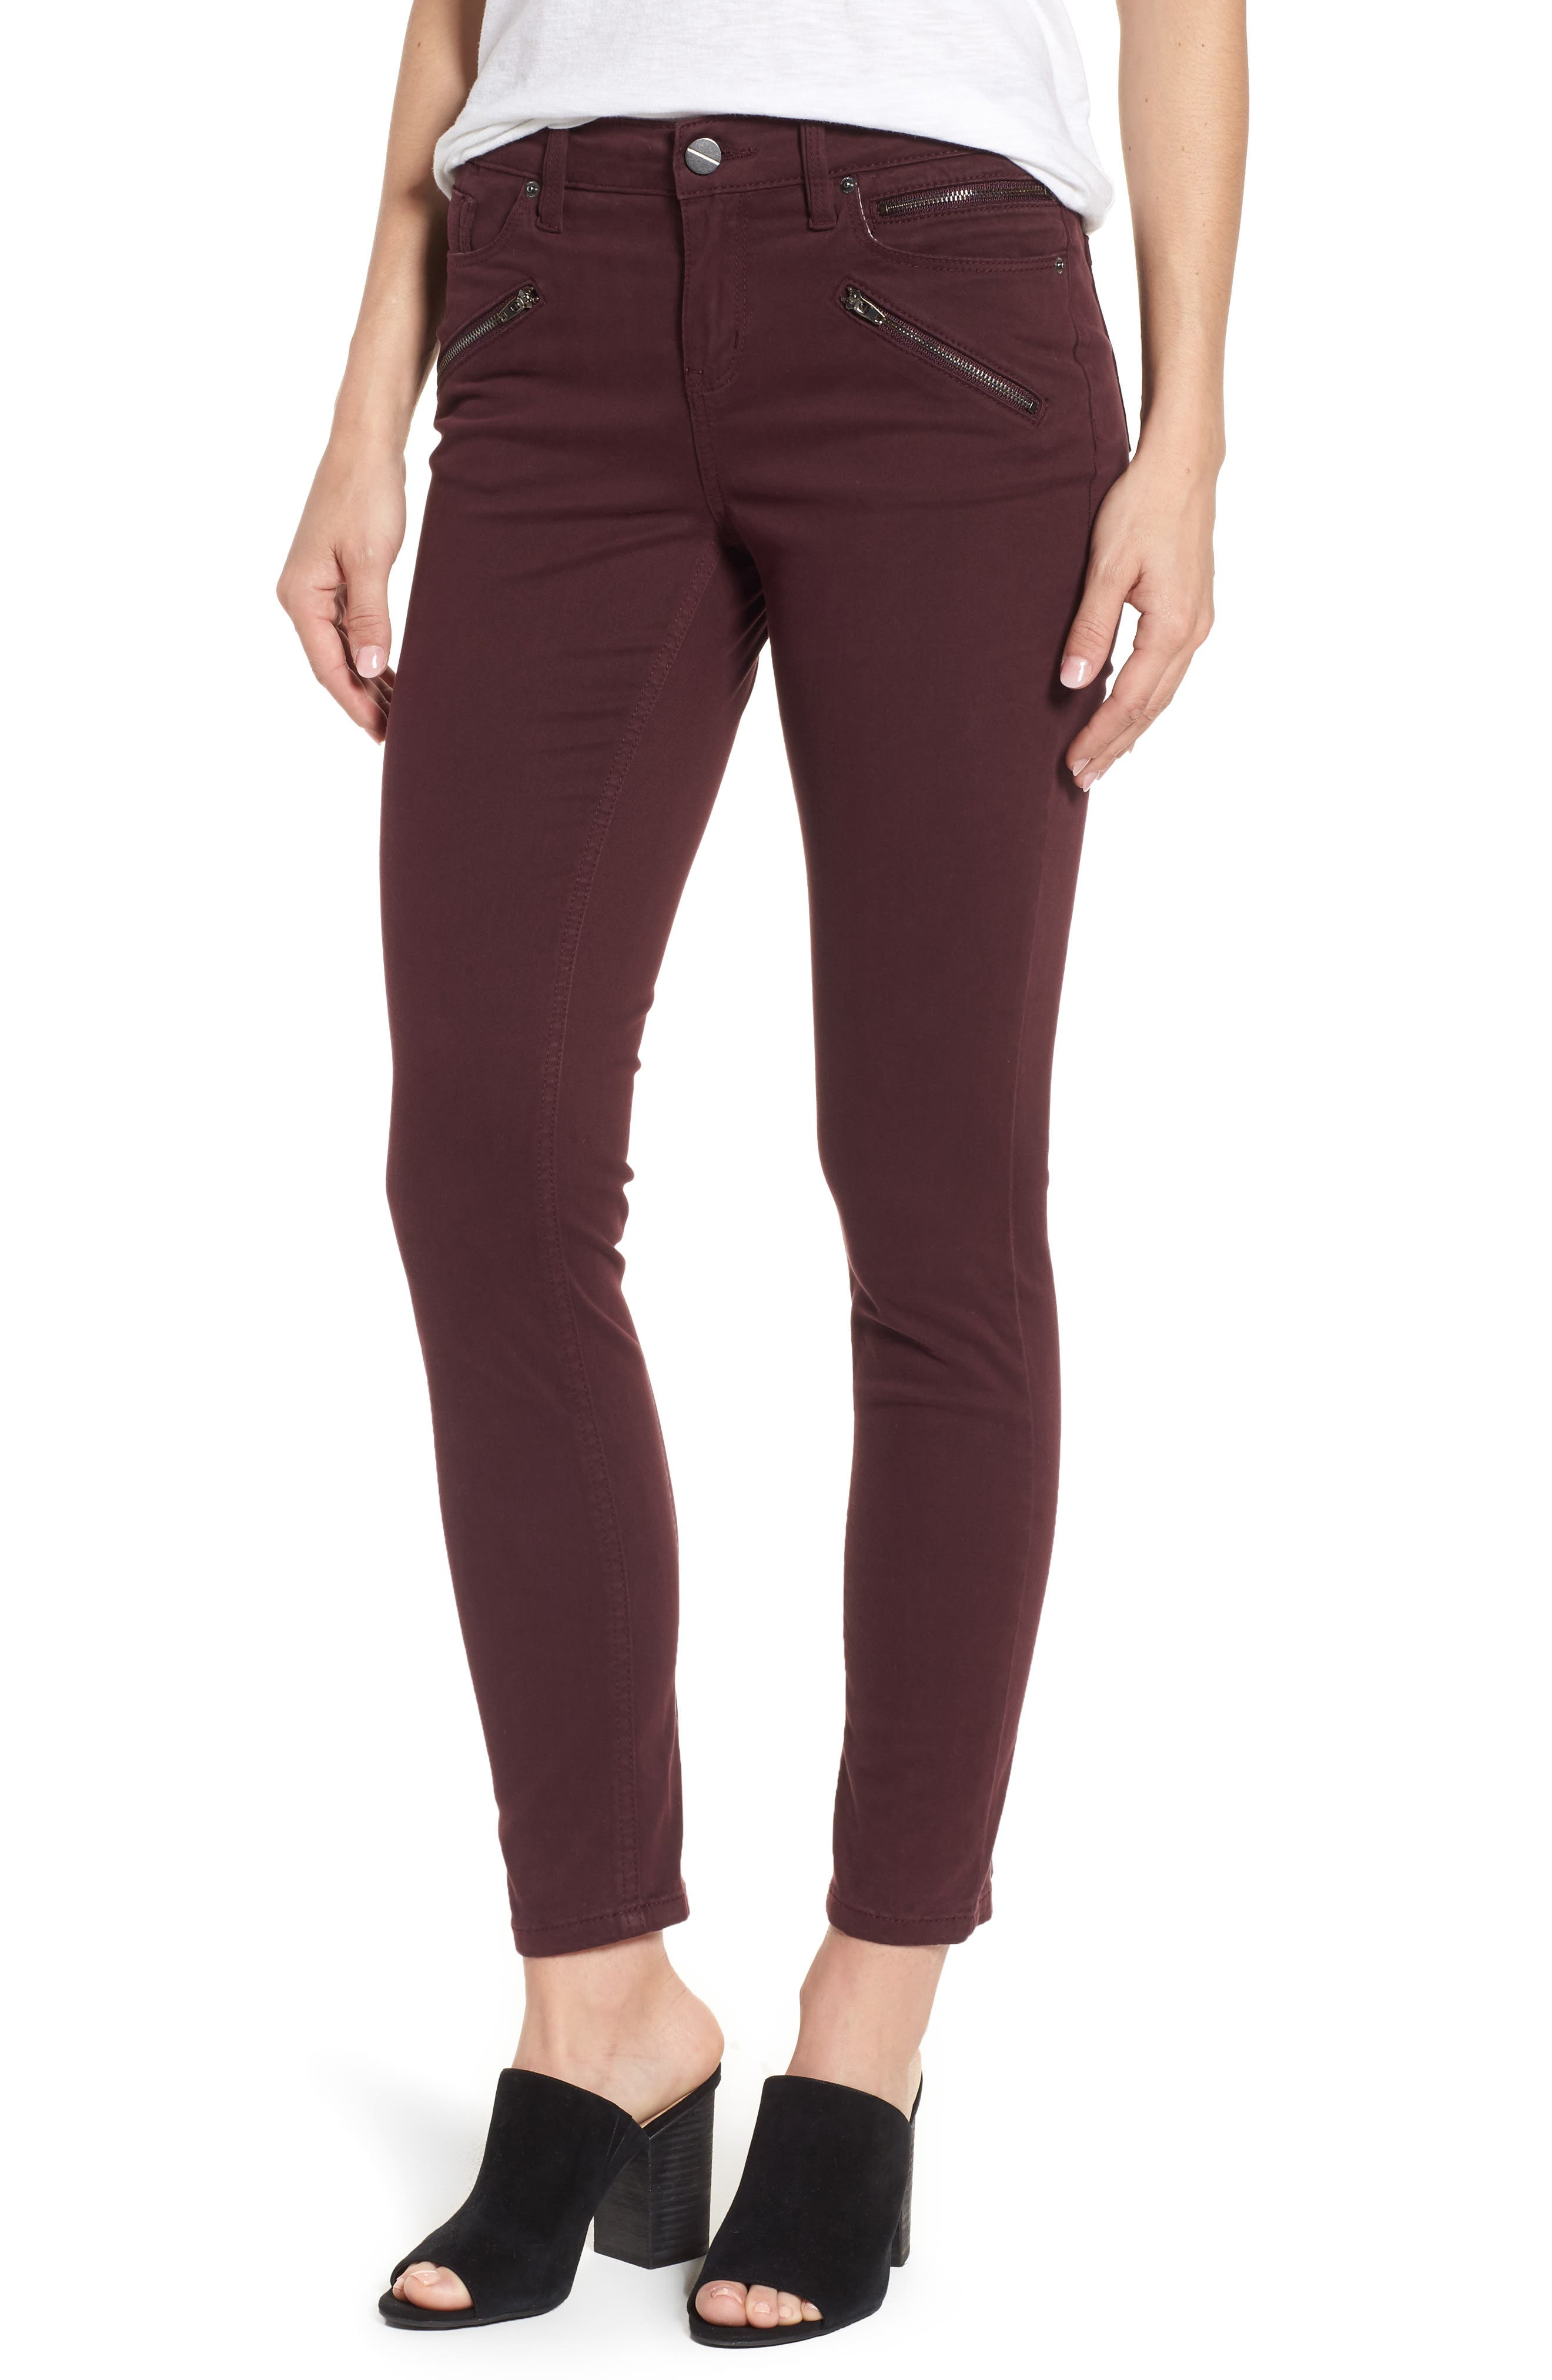 Moto Skinny Jeans,                         Main,                         color, Port